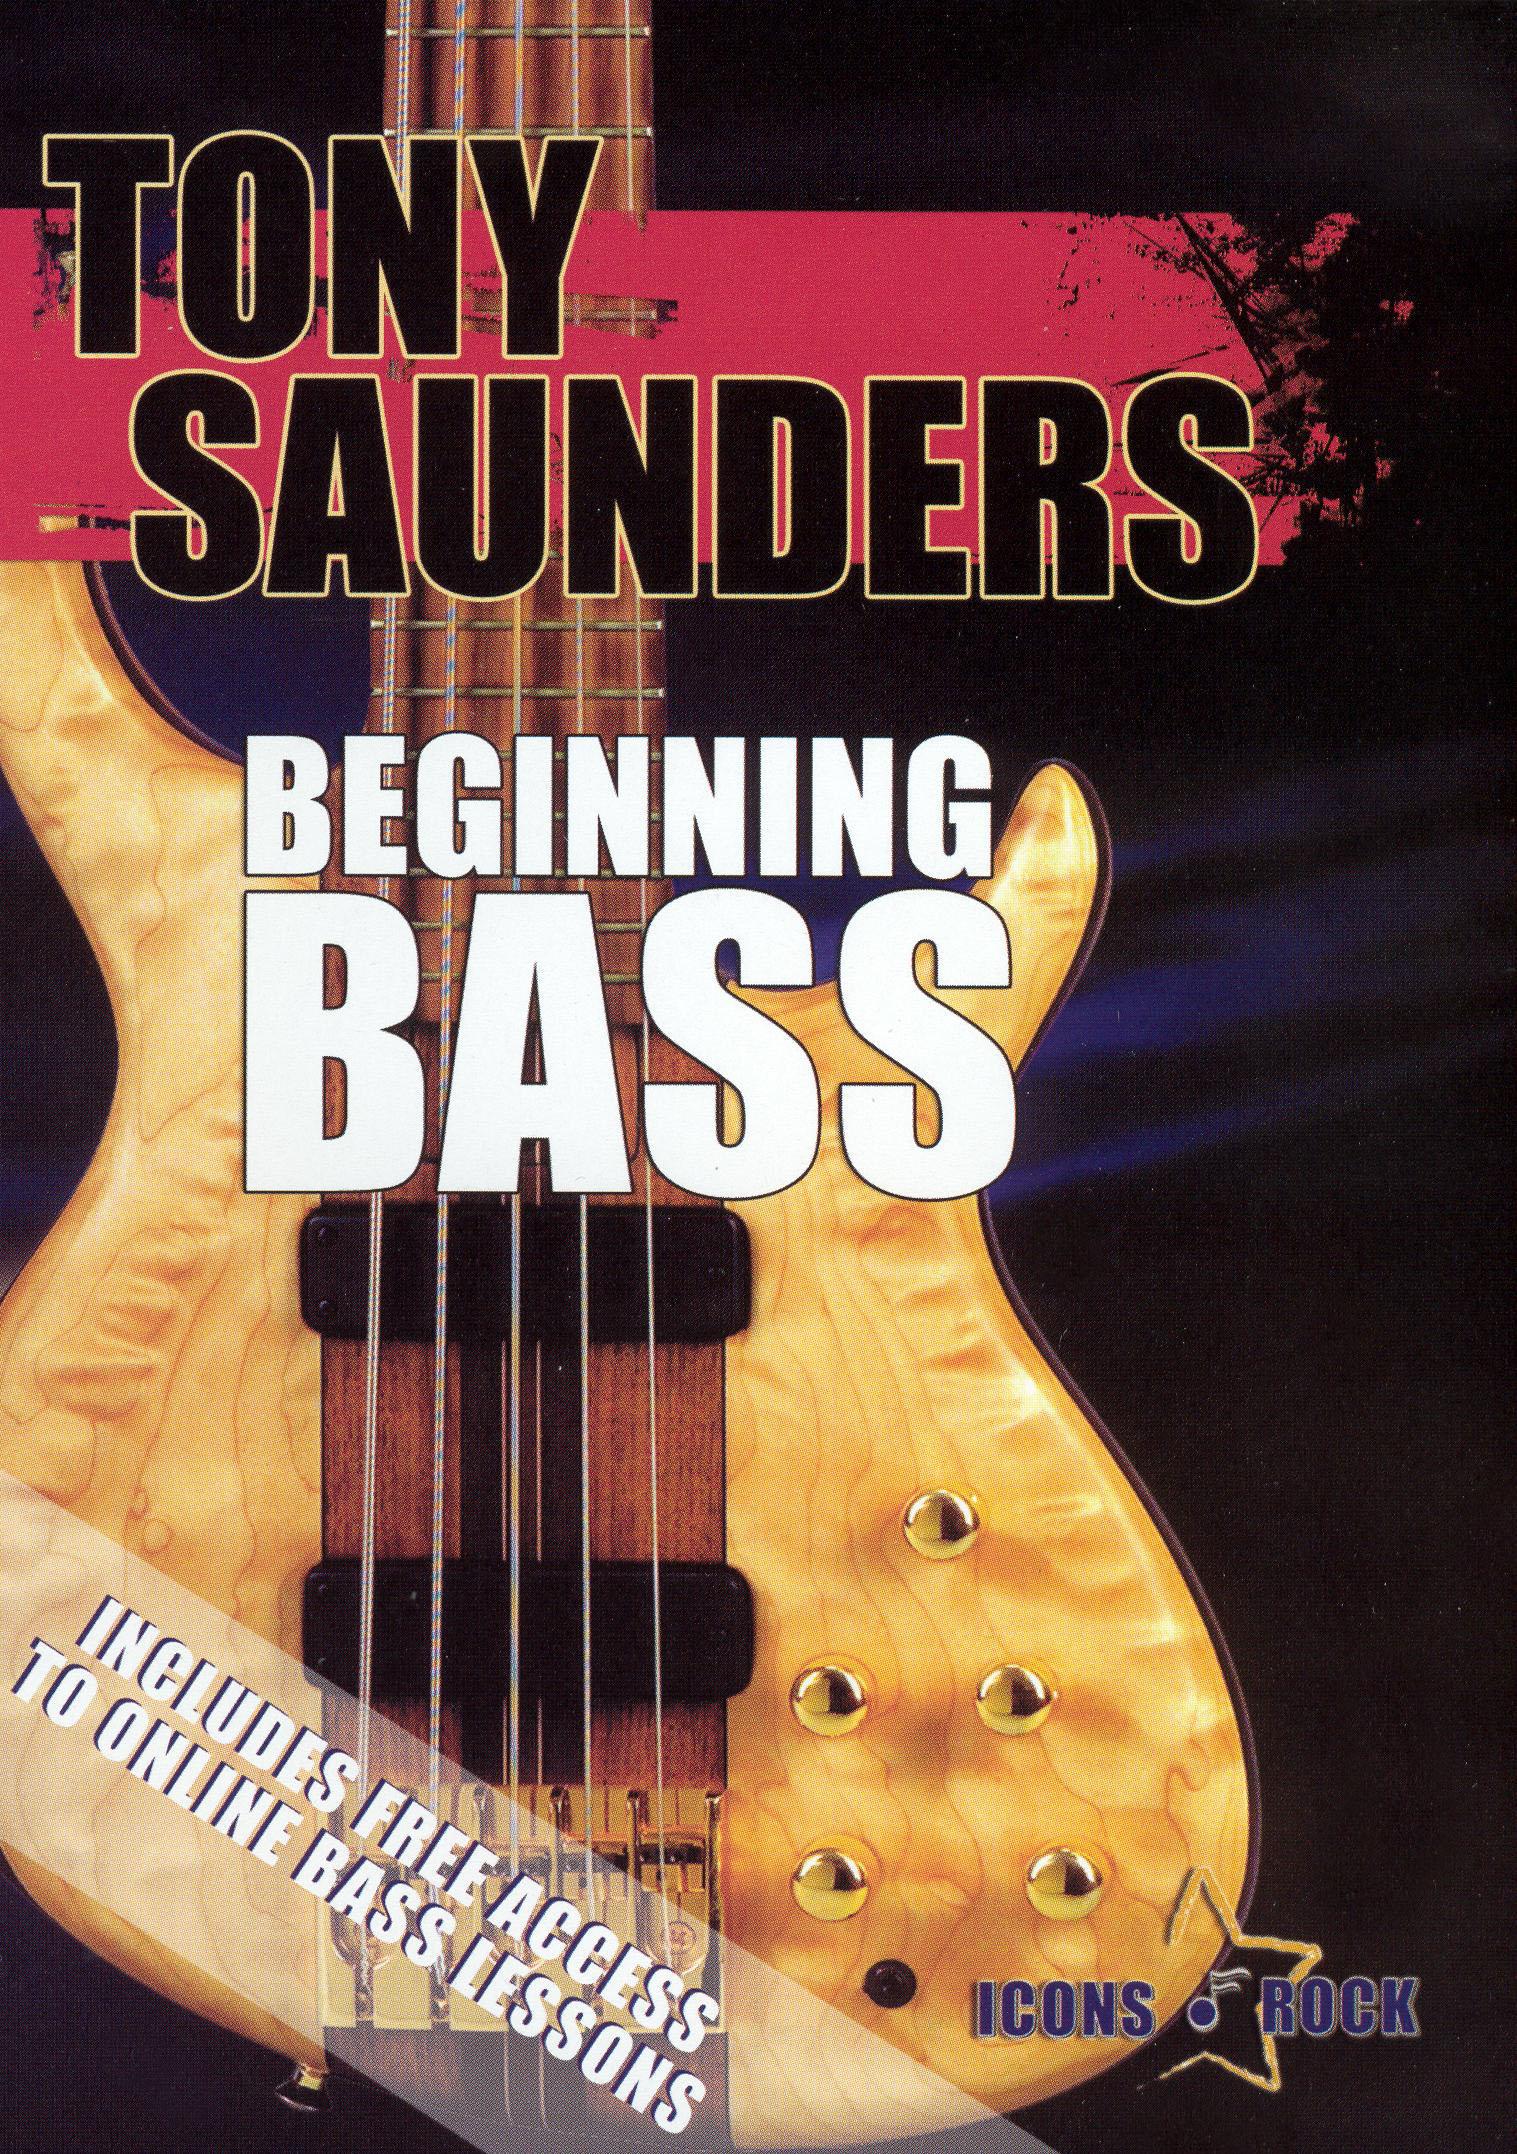 Tony Saunders: Beginning Bass